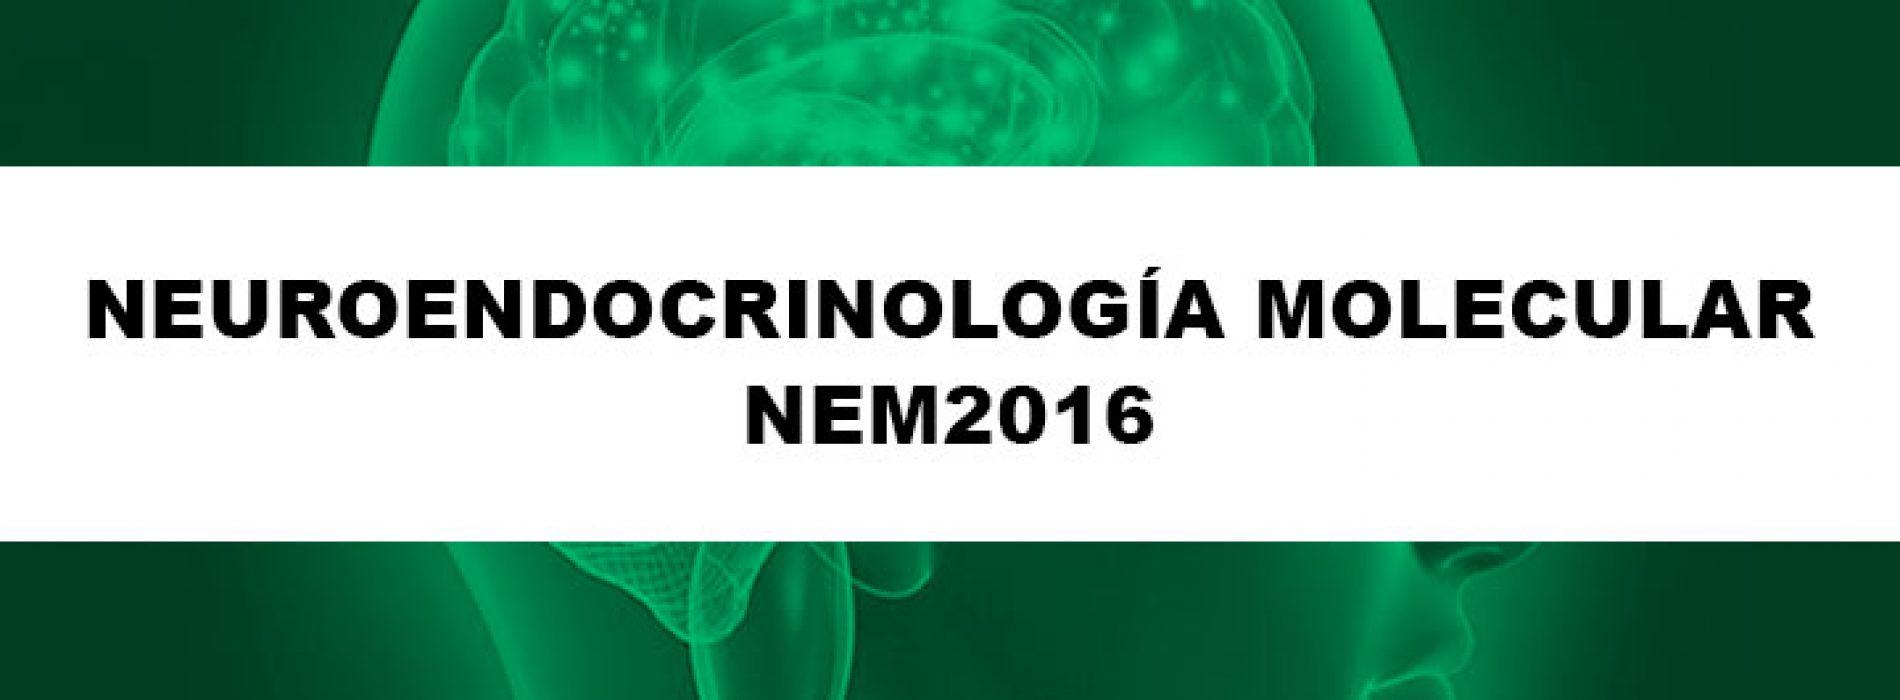 Curso de Neuroendocrinologia Molecular 2016 – 2 de agosto al 2 de septiembre de 2016